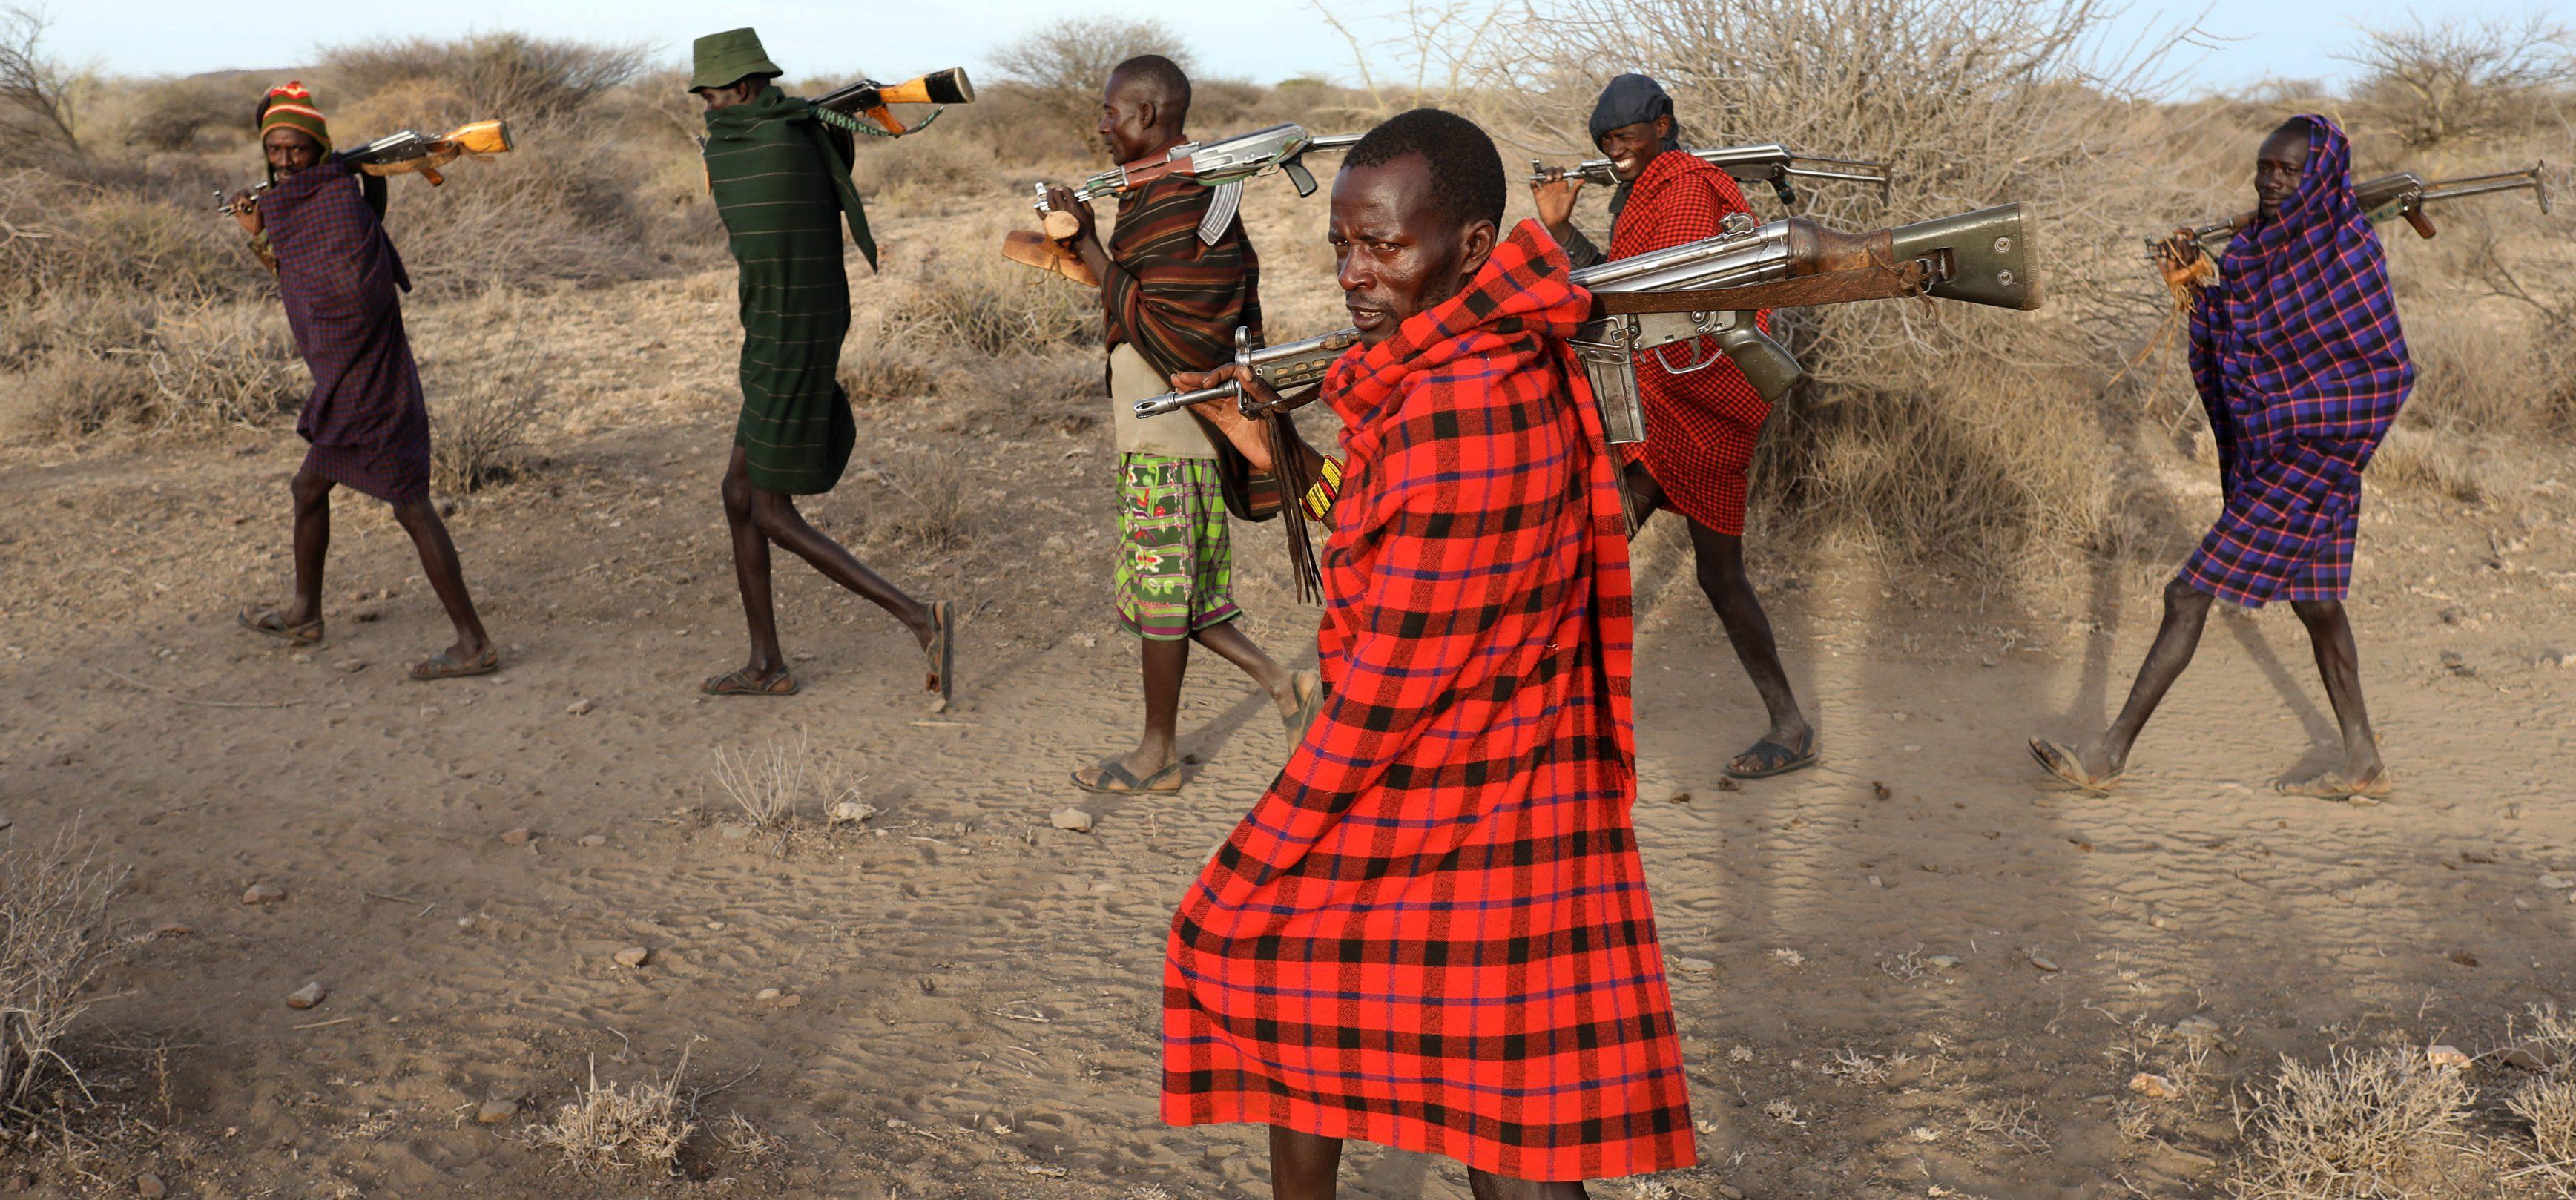 Turkana tribesmen walk with guns in order to protect their cattle from rival Pokot and Samburu tribesmen near Baragoy, Kenya February 14, 2017.